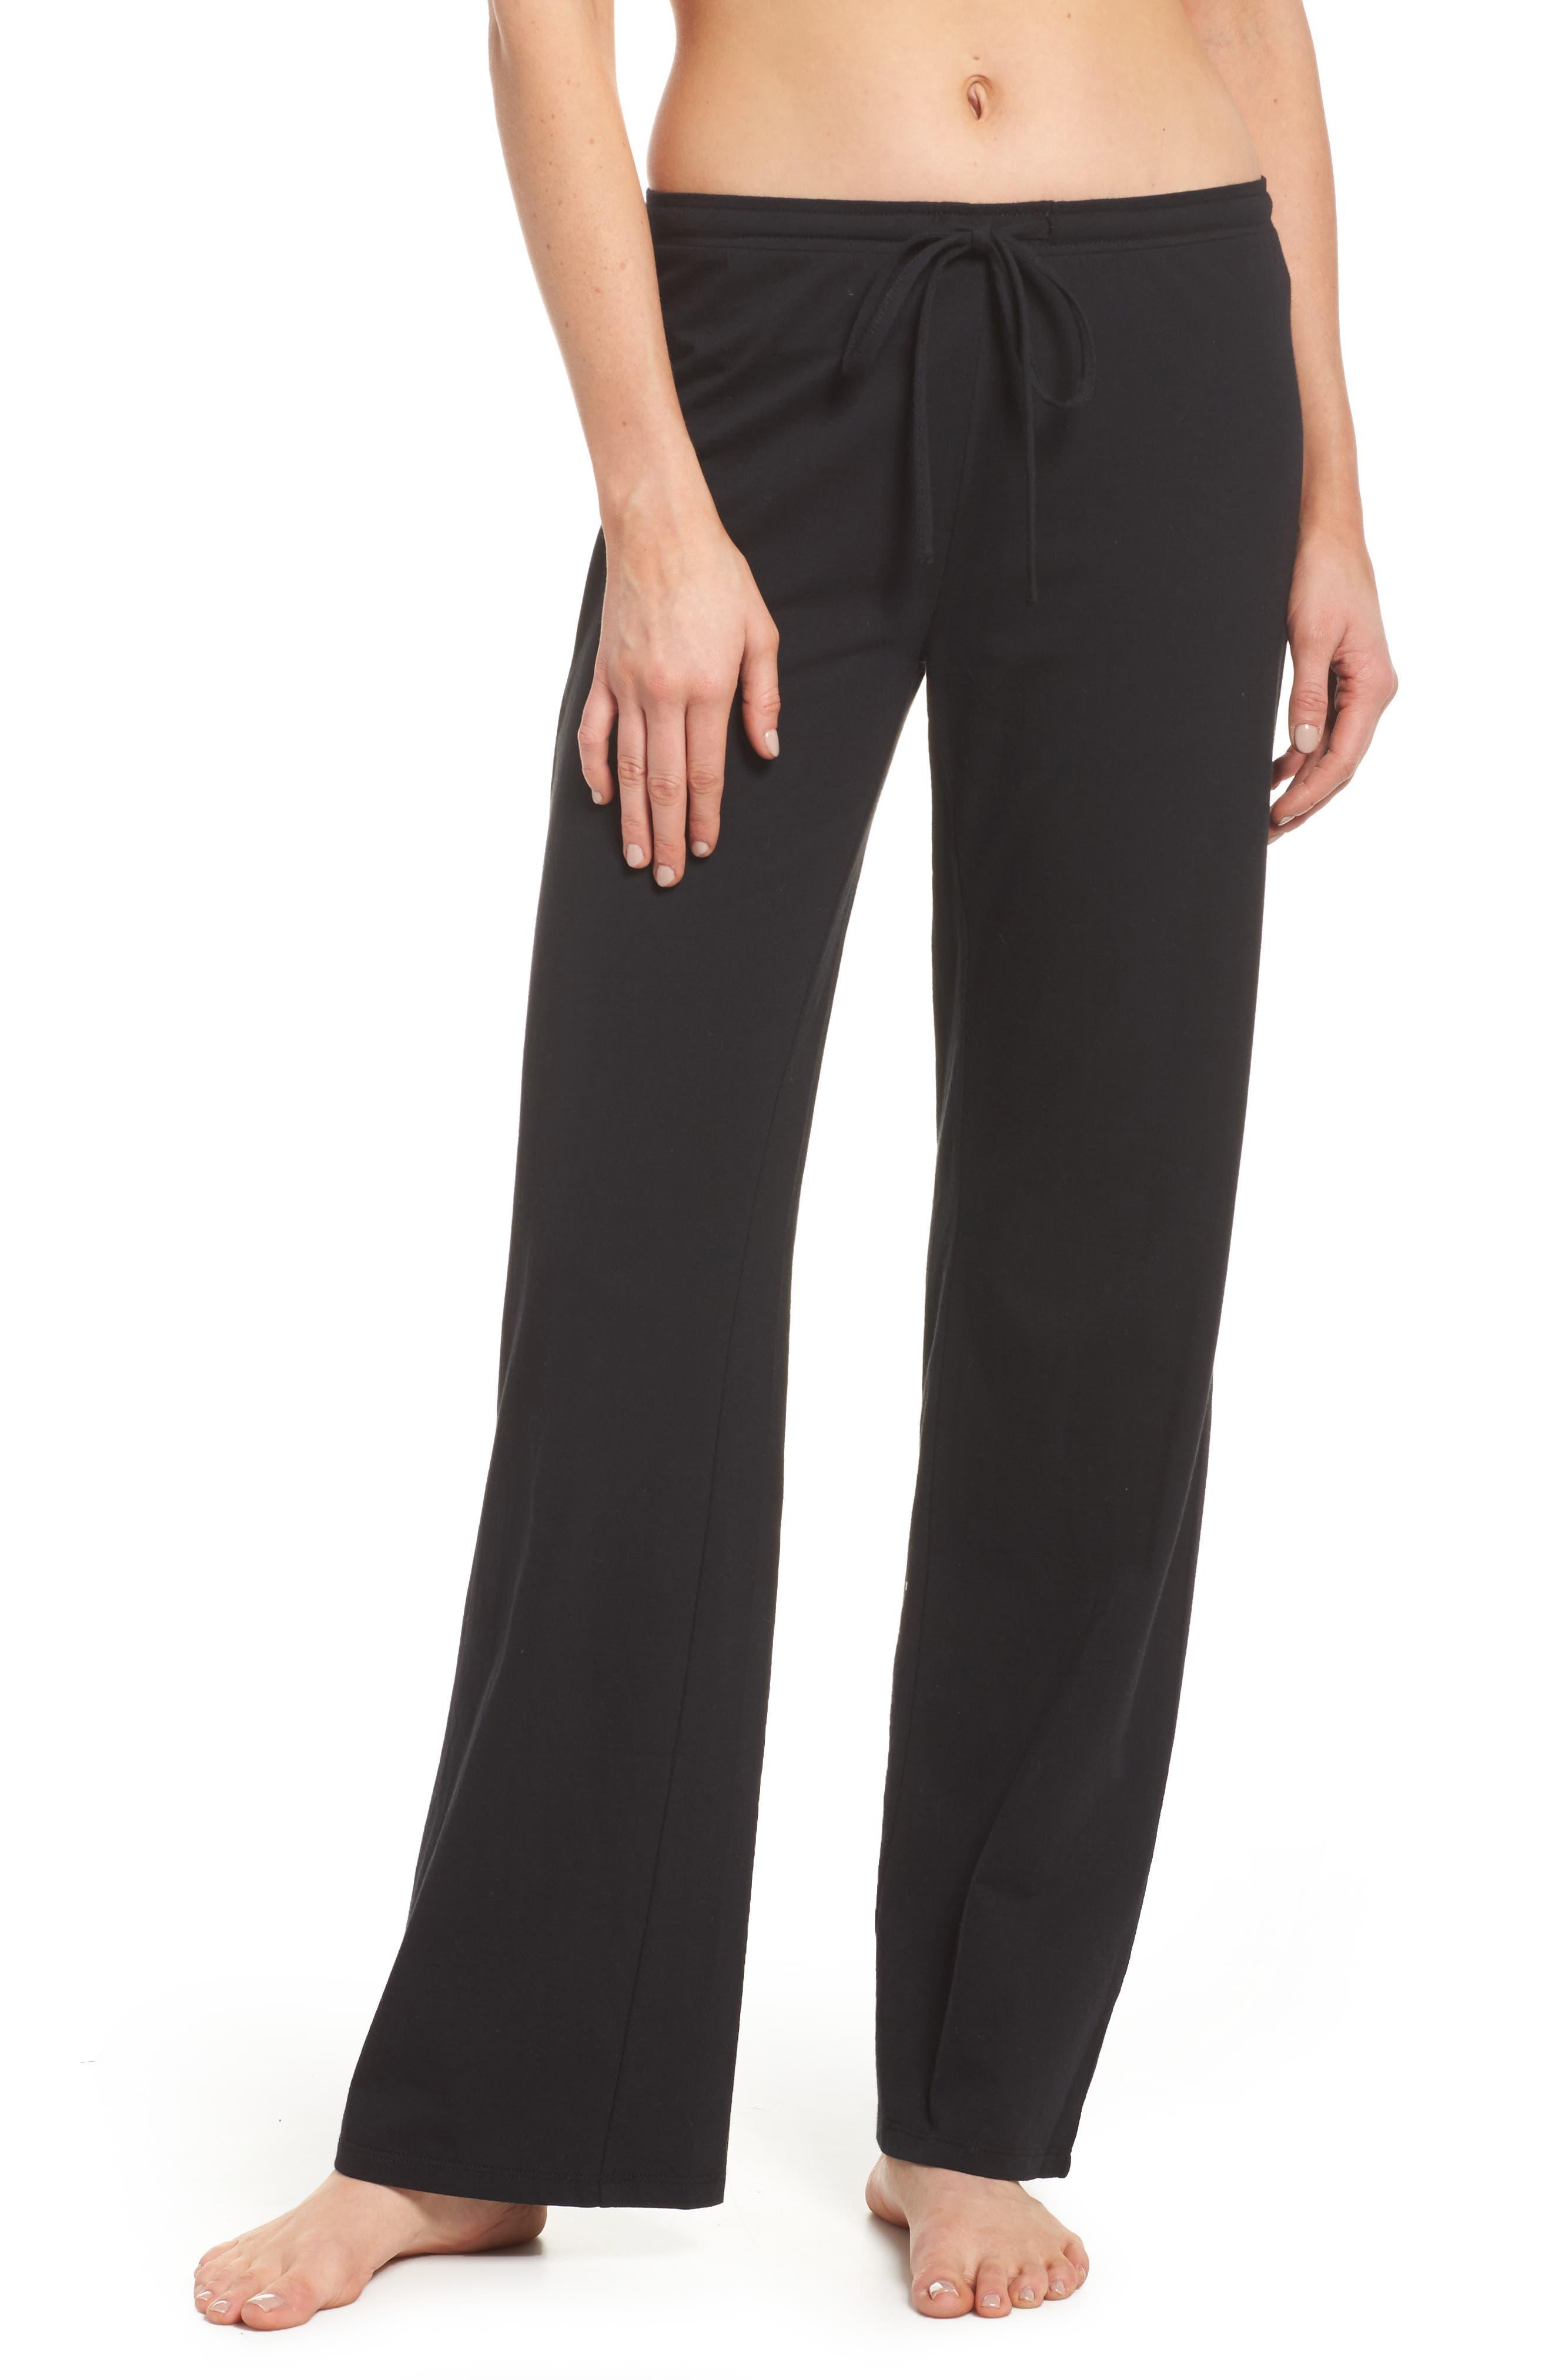 Breathe Lounge Pants,                         Main,                         color, 001